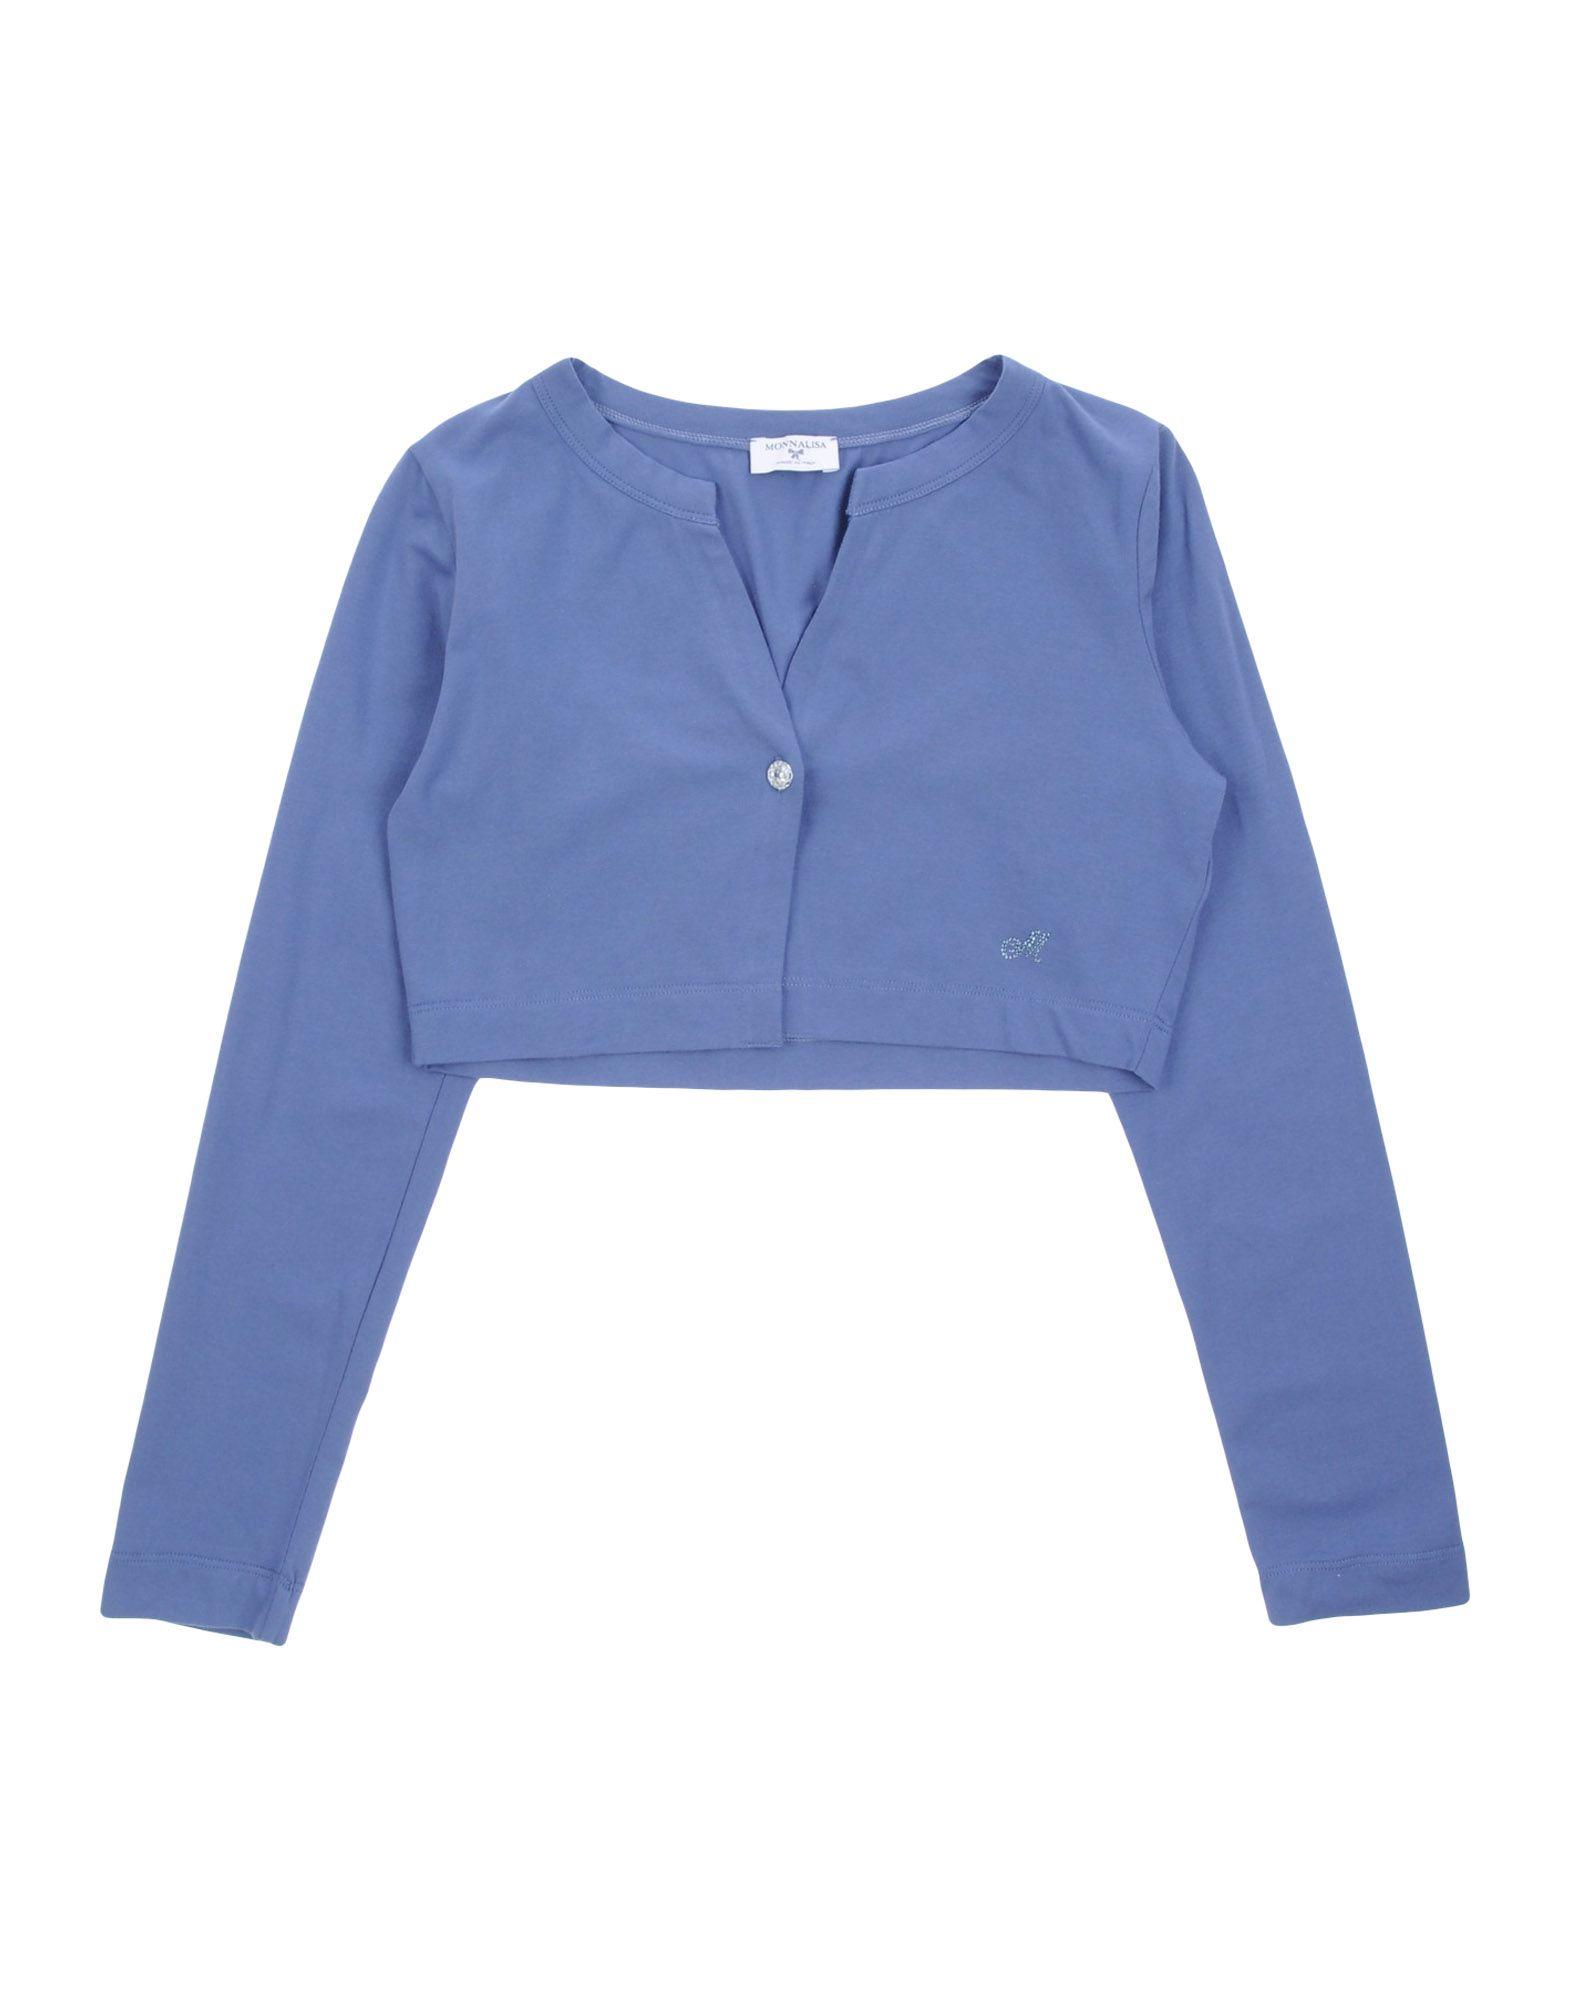 MONNALISA Cardigan in Slate Blue